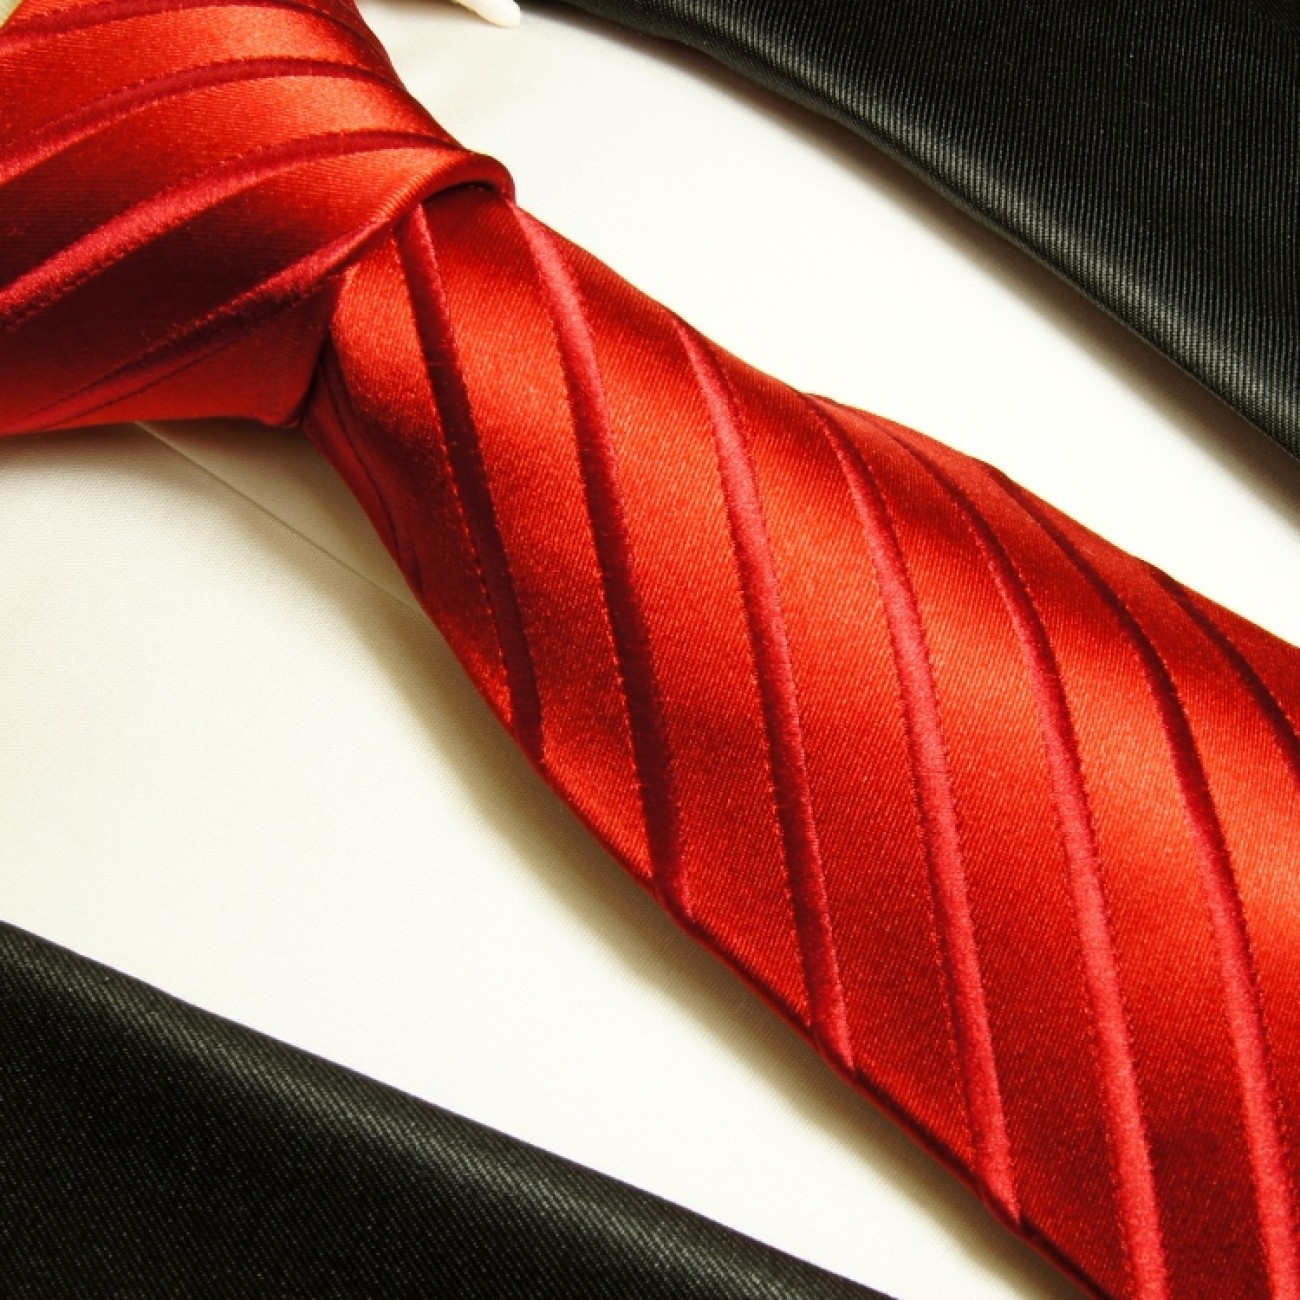 paul malone shop paul malone krawatte 100 seide rot 441. Black Bedroom Furniture Sets. Home Design Ideas